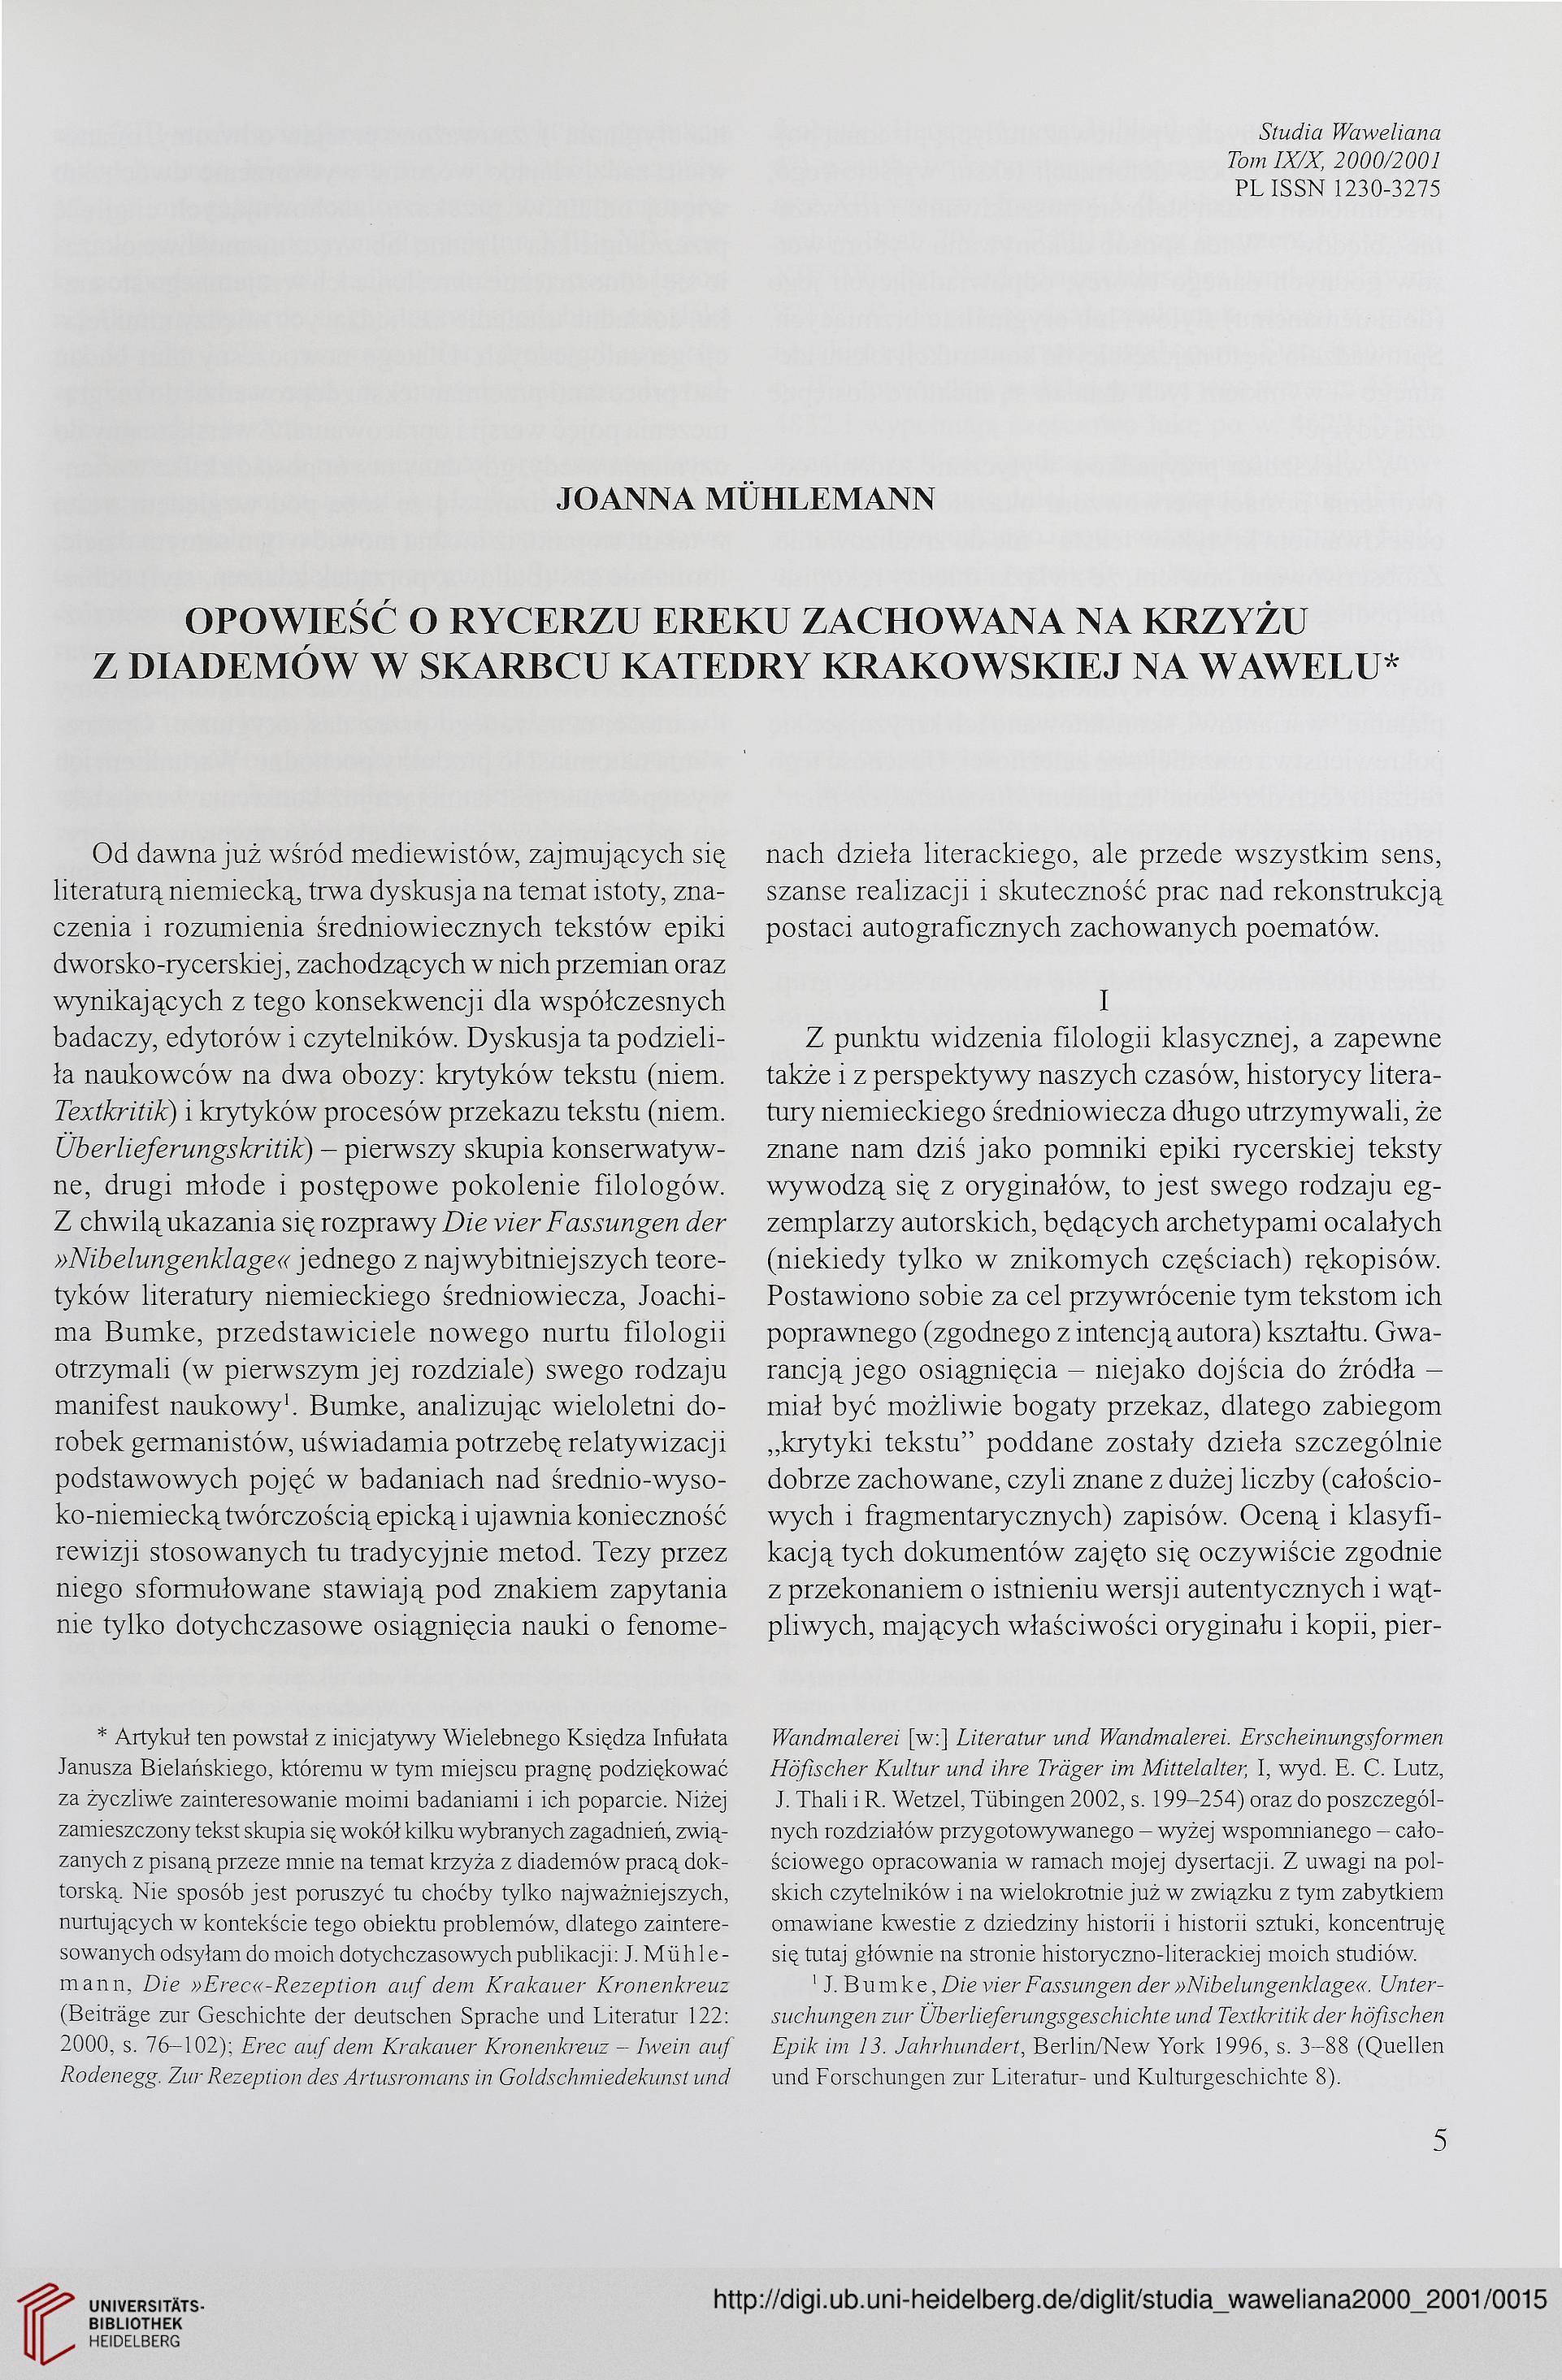 Studia Waweliana 9102000 2001